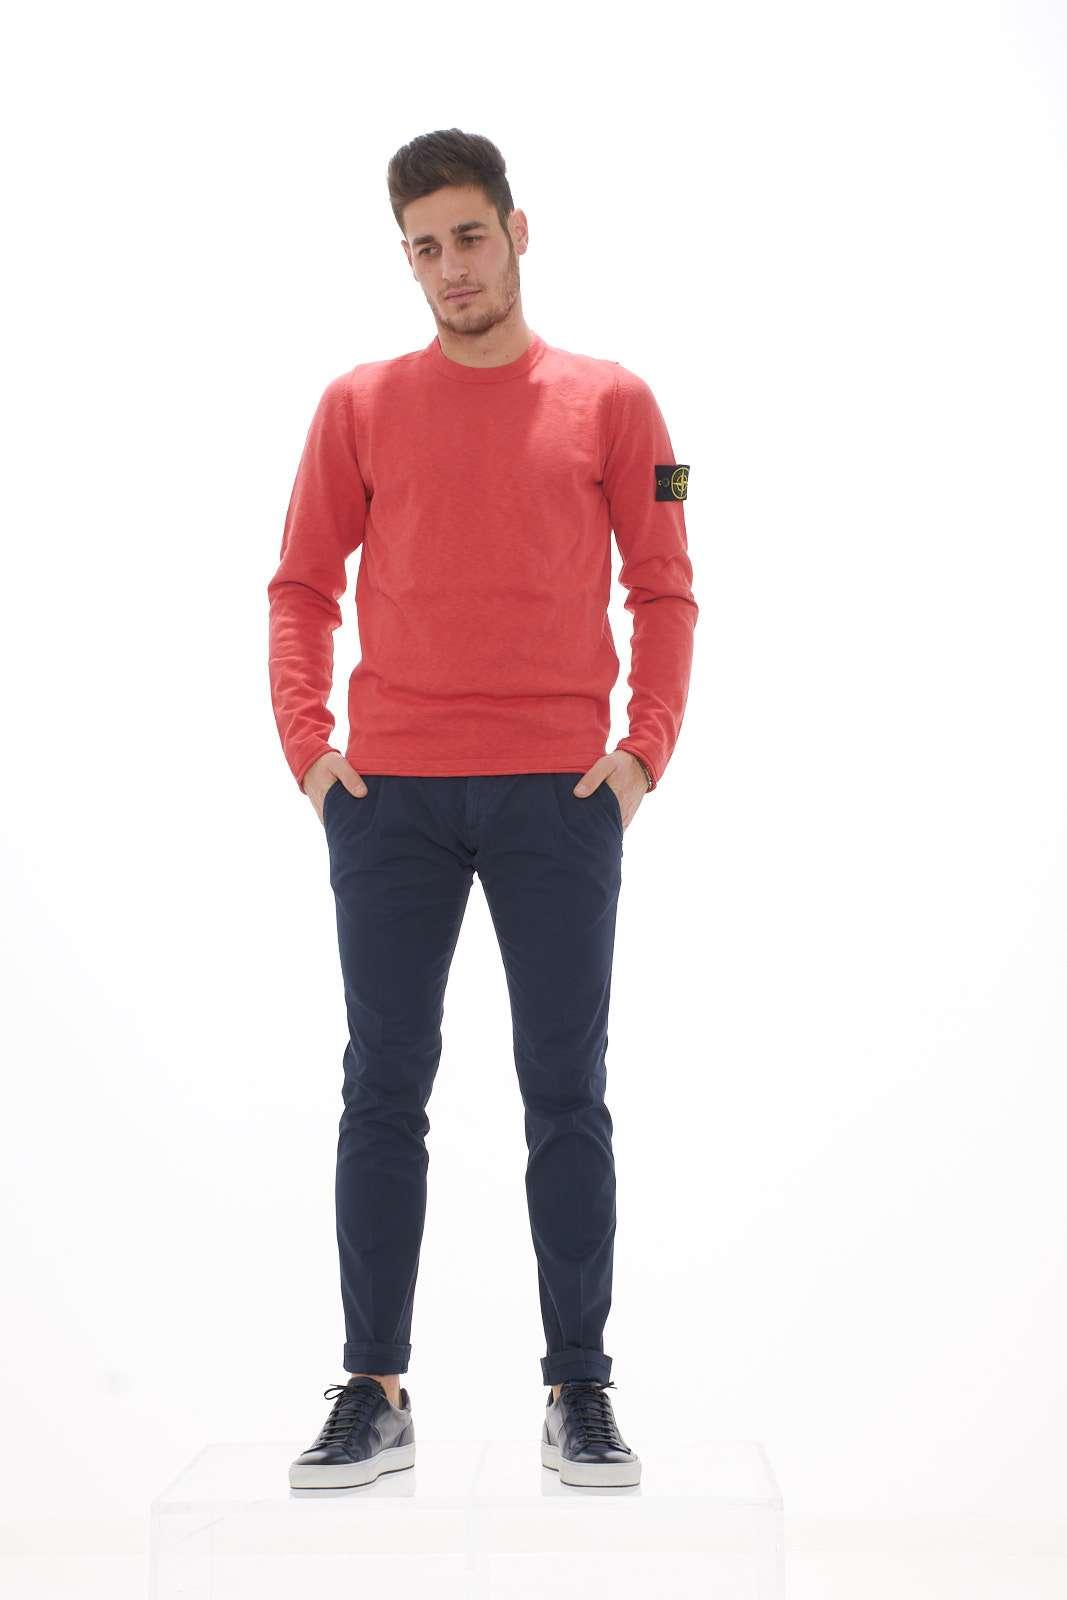 https://www.parmax.com/media/catalog/product/a/i/PE-outlet_parmax-pantaloni-uomo-Michael-Coal-FREDER2532-D.jpg